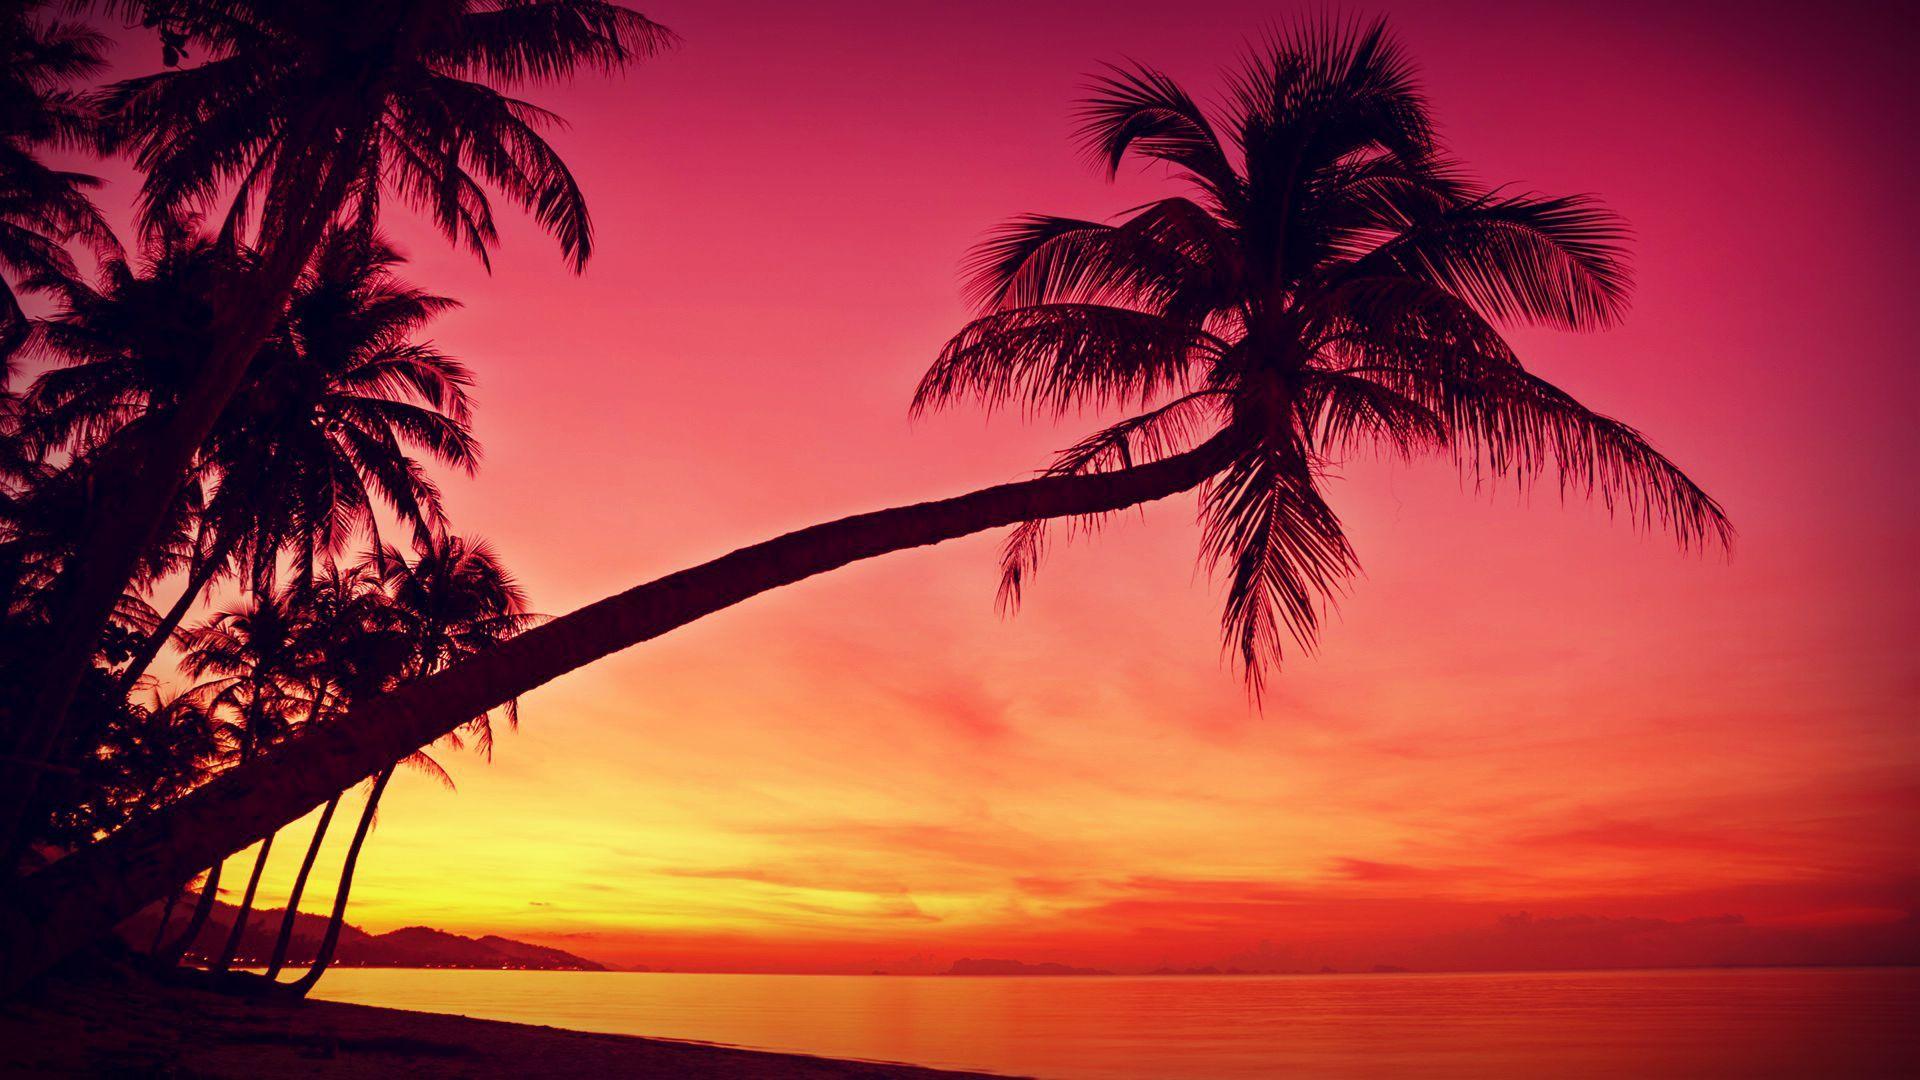 HD Tropical, Sunset, Palm Trees, Silhouette, Beach